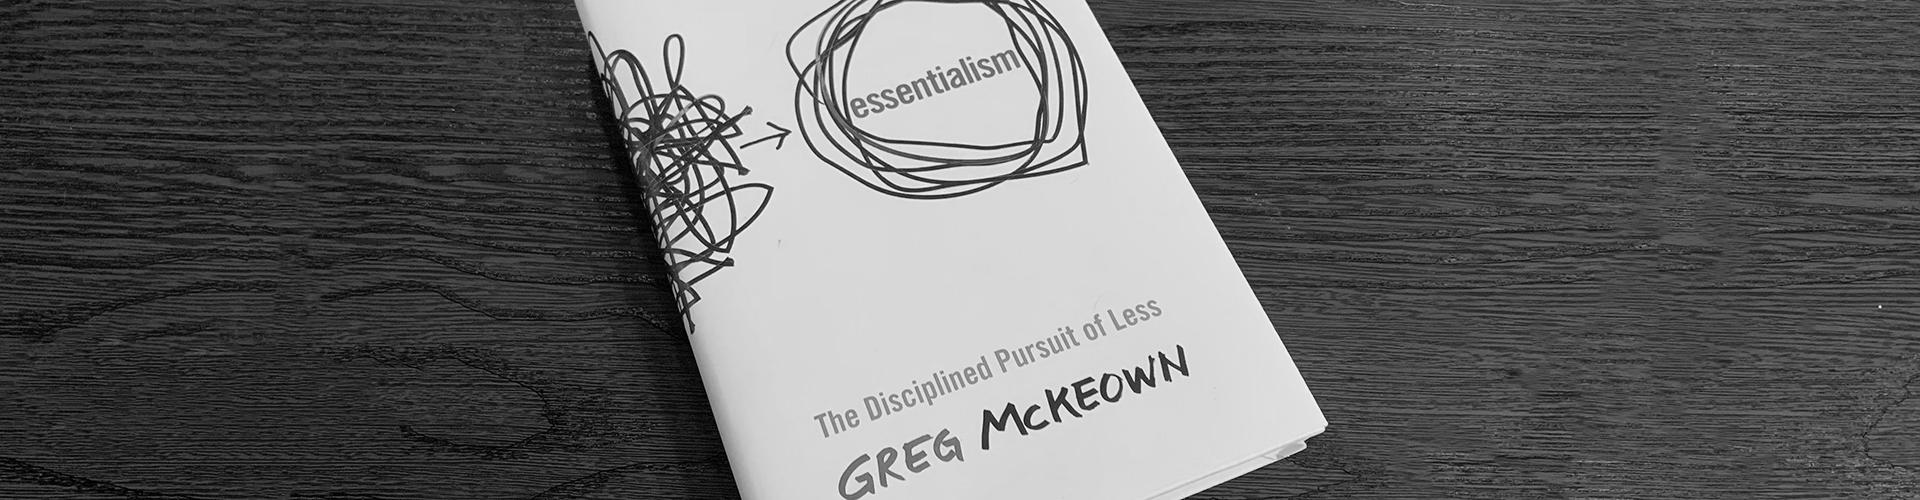 essentialism-book